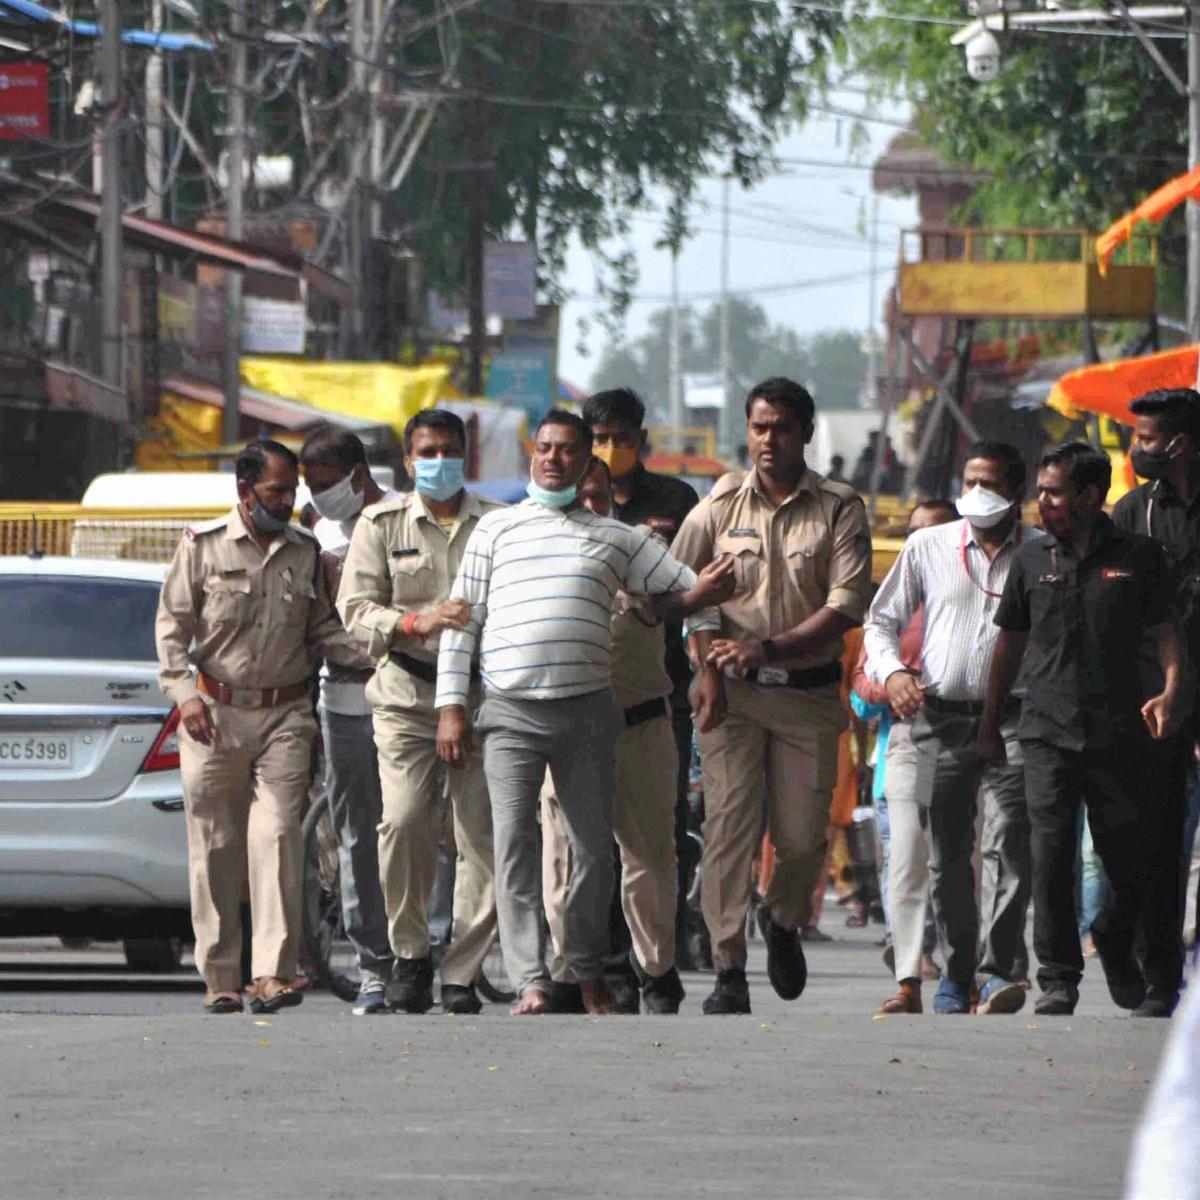 Uttar Pradesh's dreaded gangster Vikas Dubey, on the run, is 'nabbed' in MP Temple